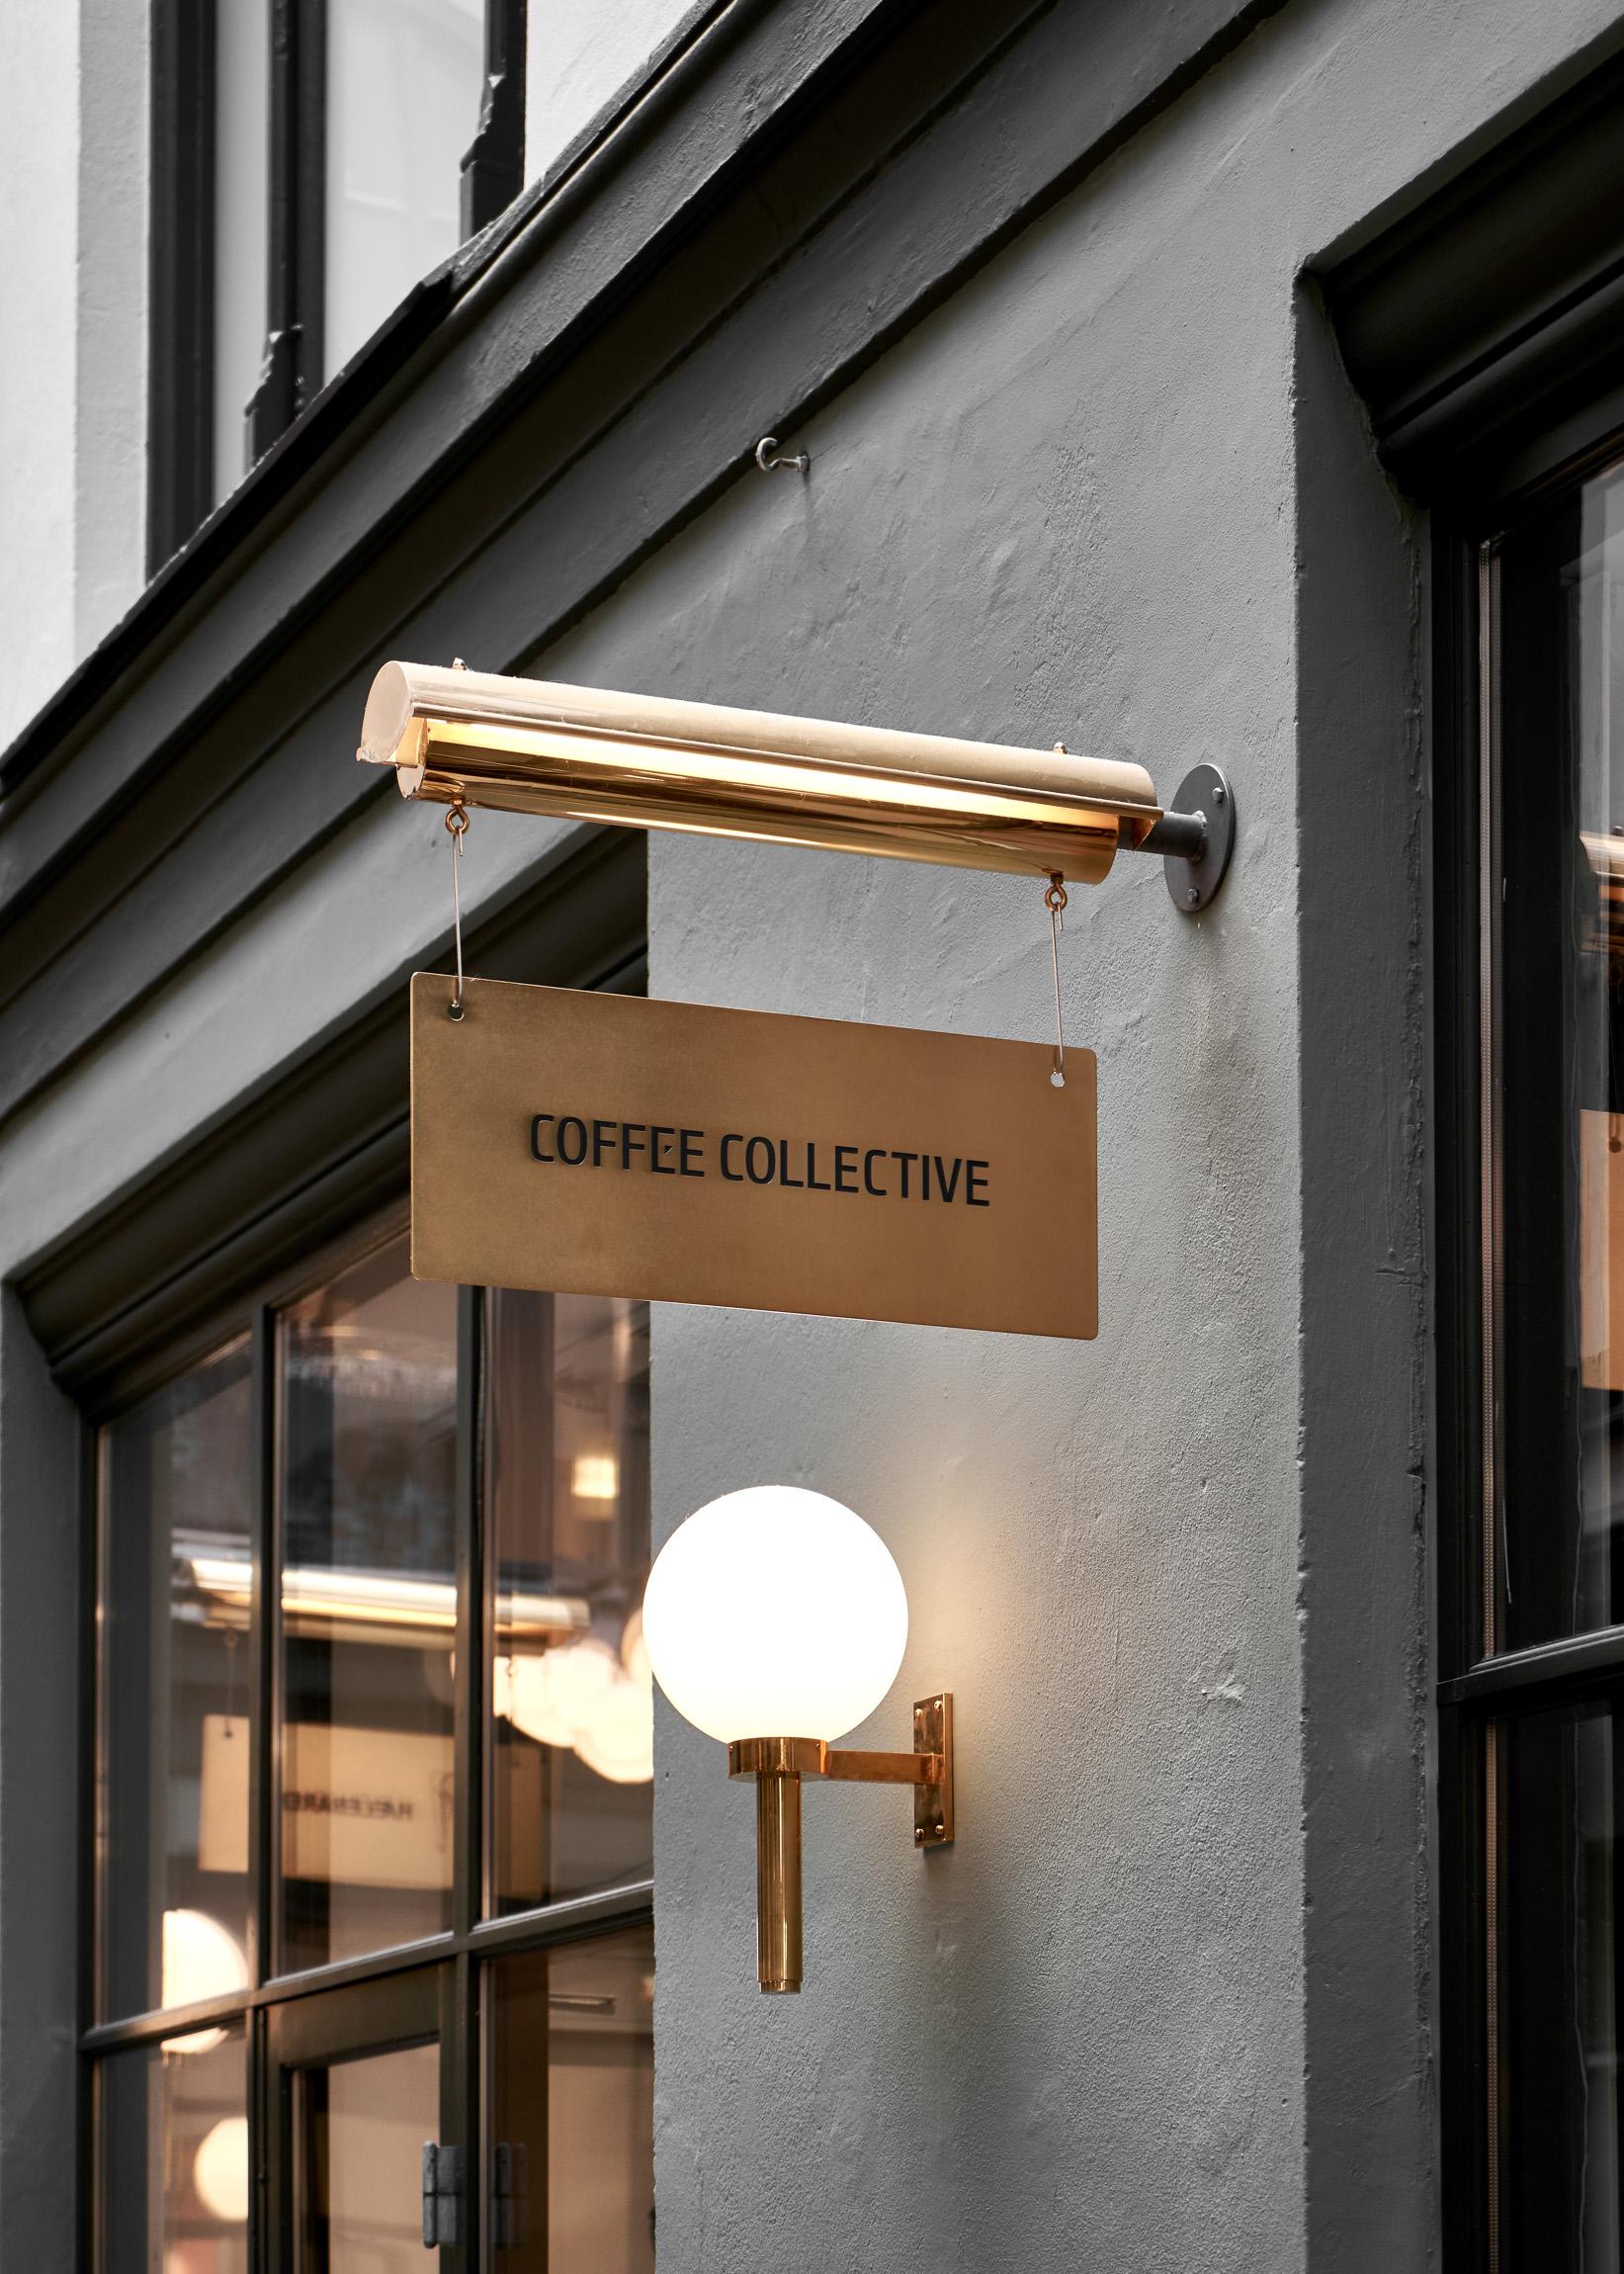 Coffee Collective Copenhagen - Guide to cafes in Copenhagen